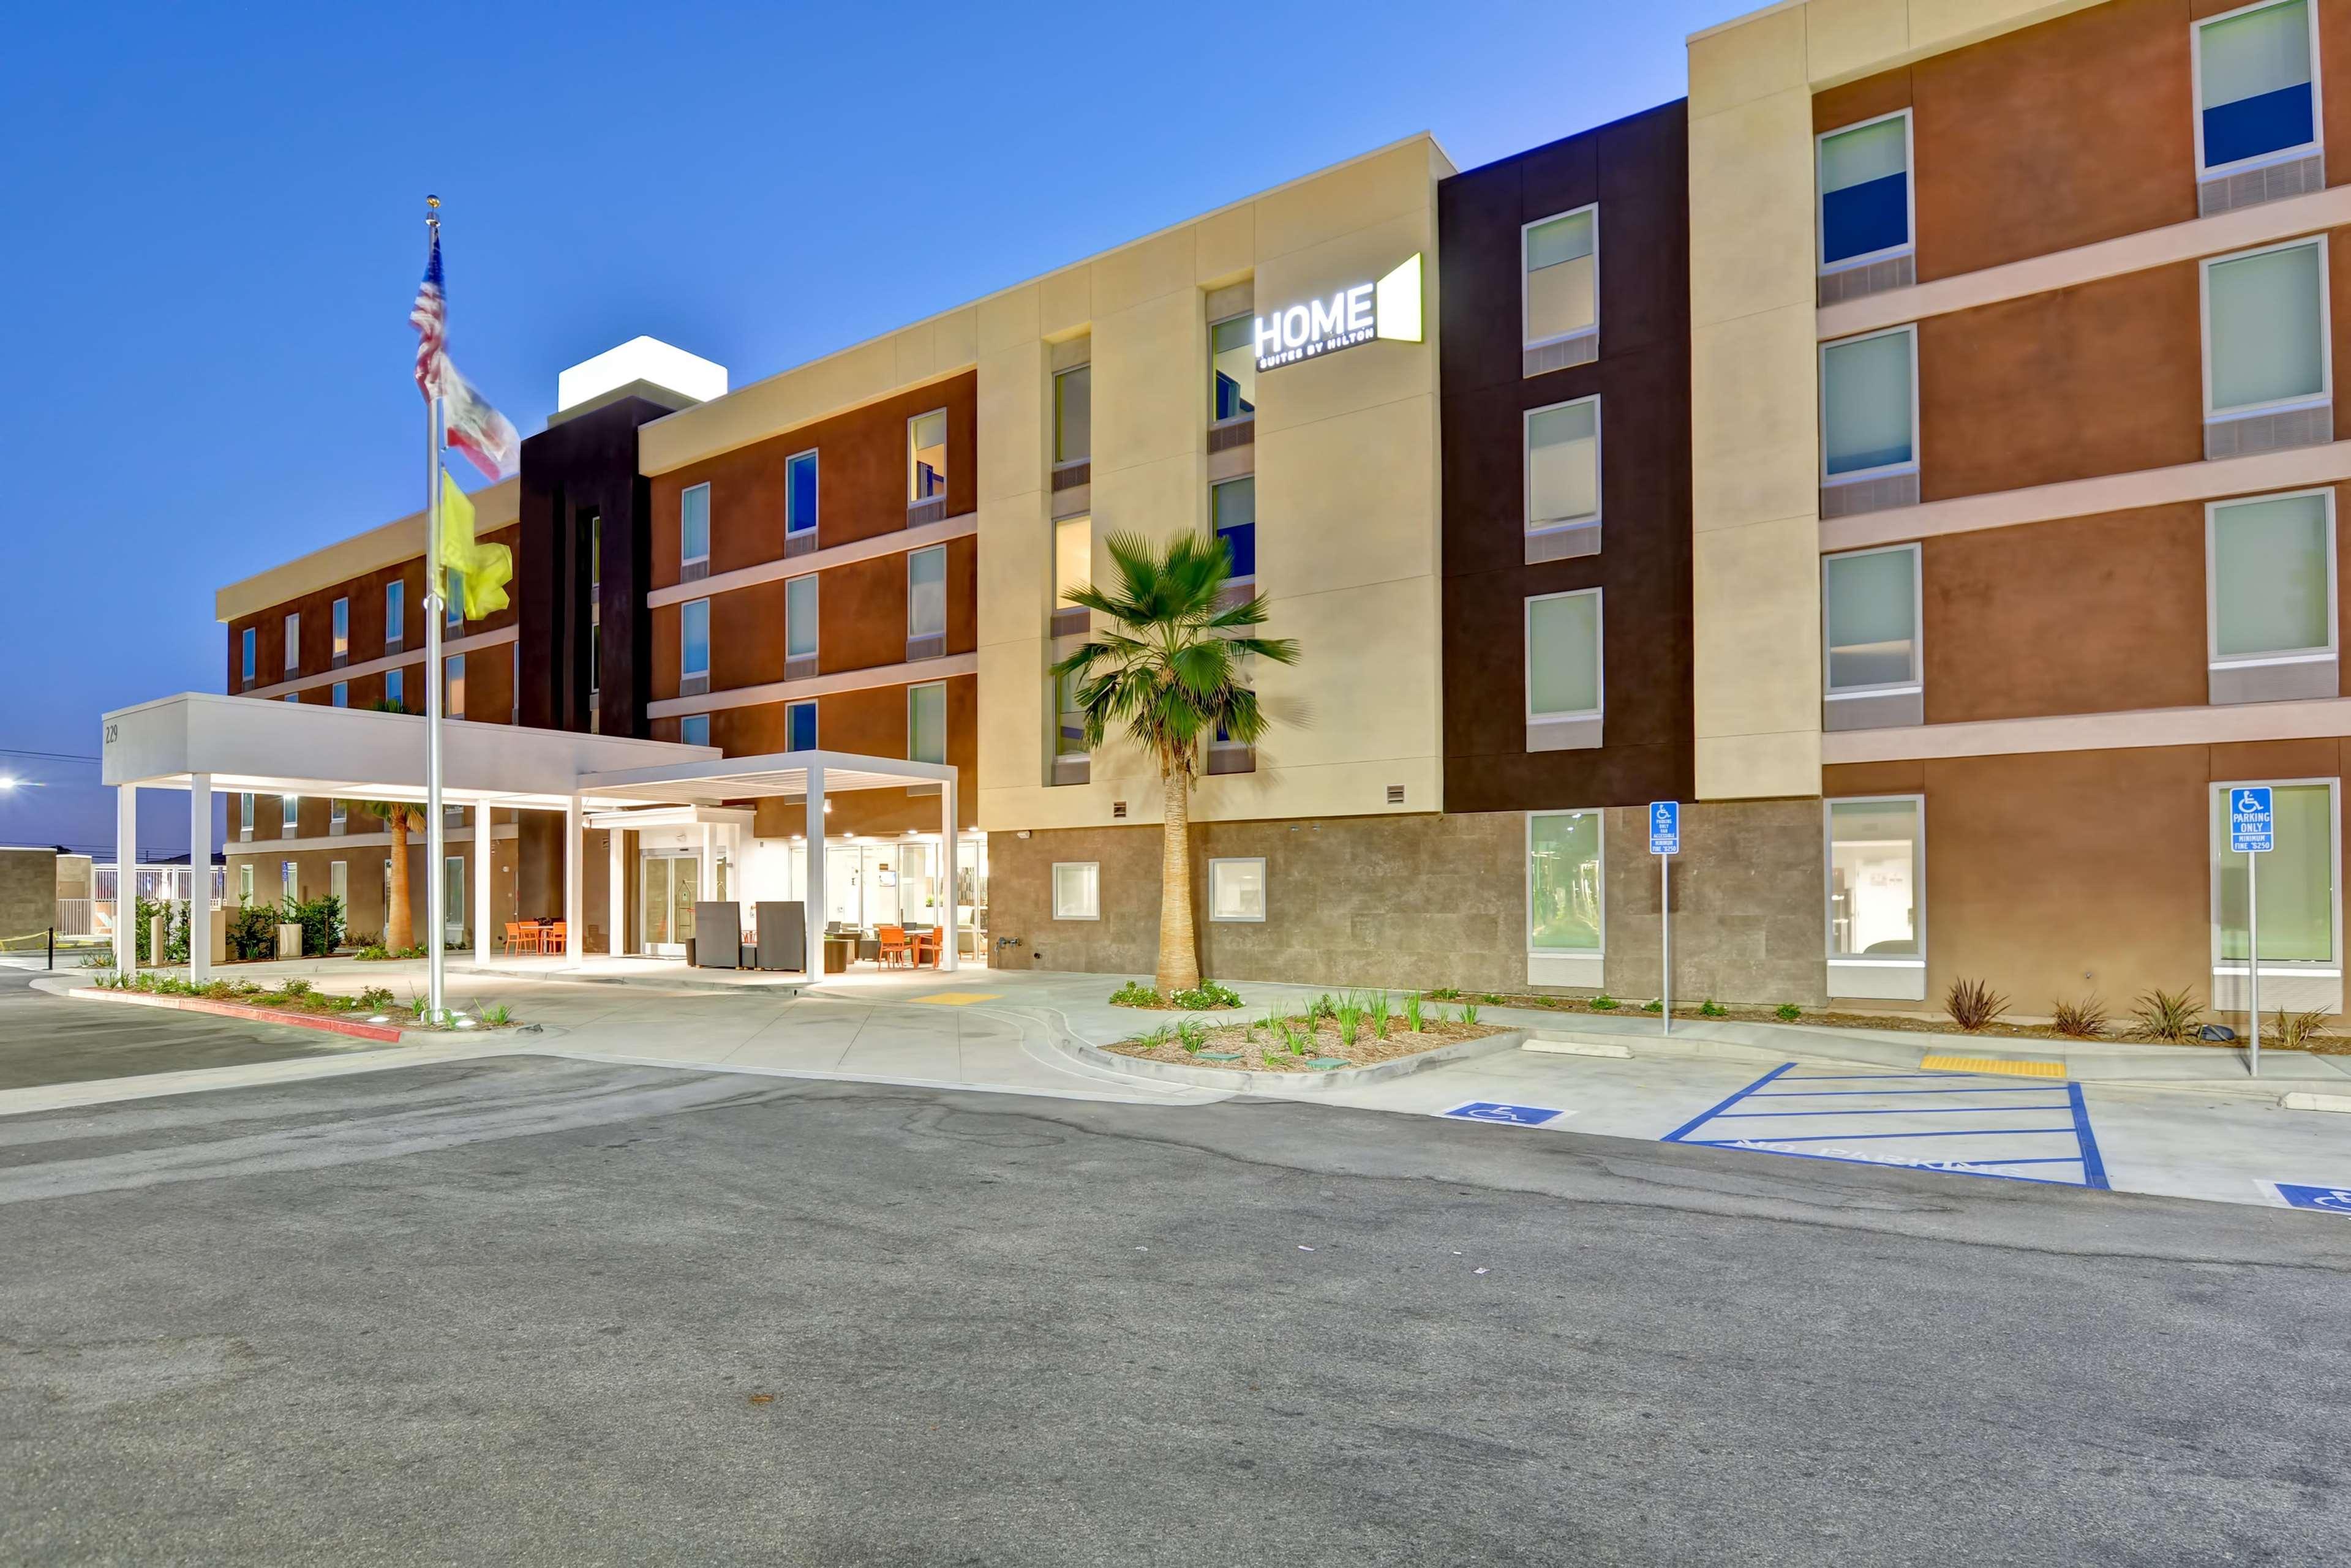 Home2 Suites by Hilton Azusa image 17